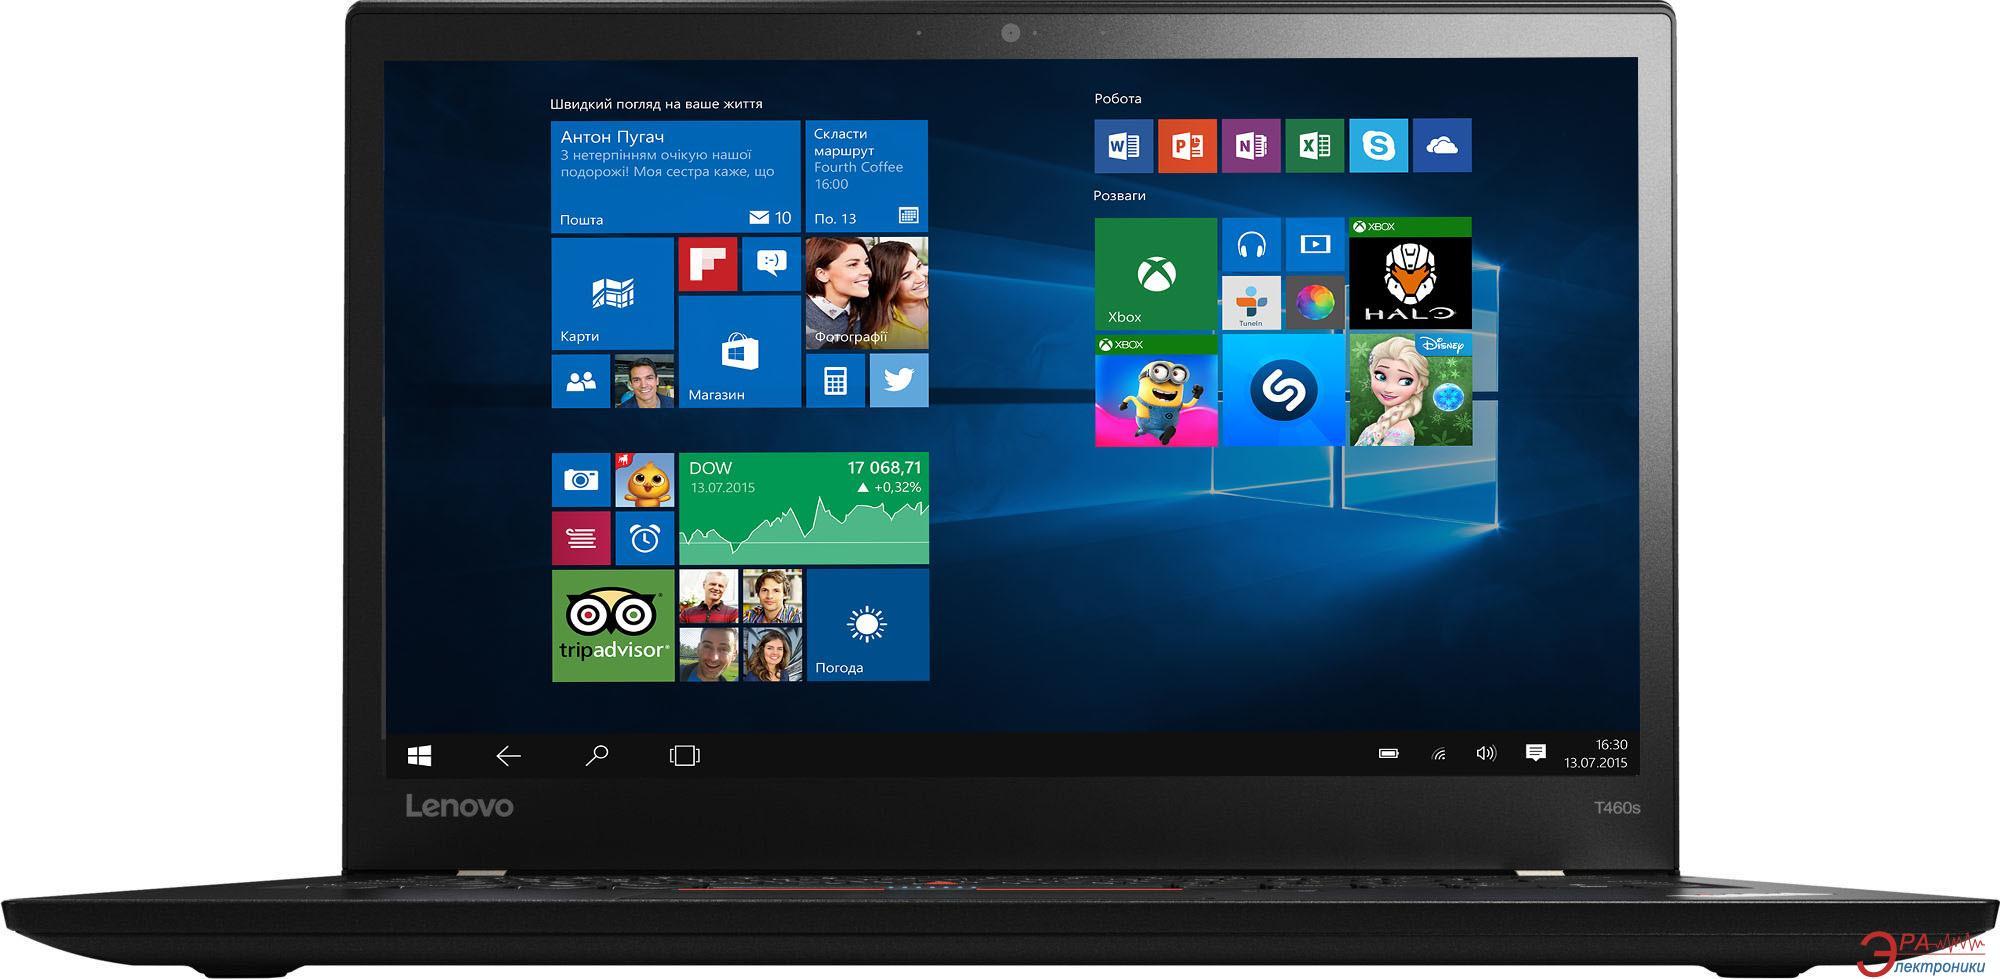 Ноутбук Lenovo ThinkPad T460p (20FWS00W00) Black 14